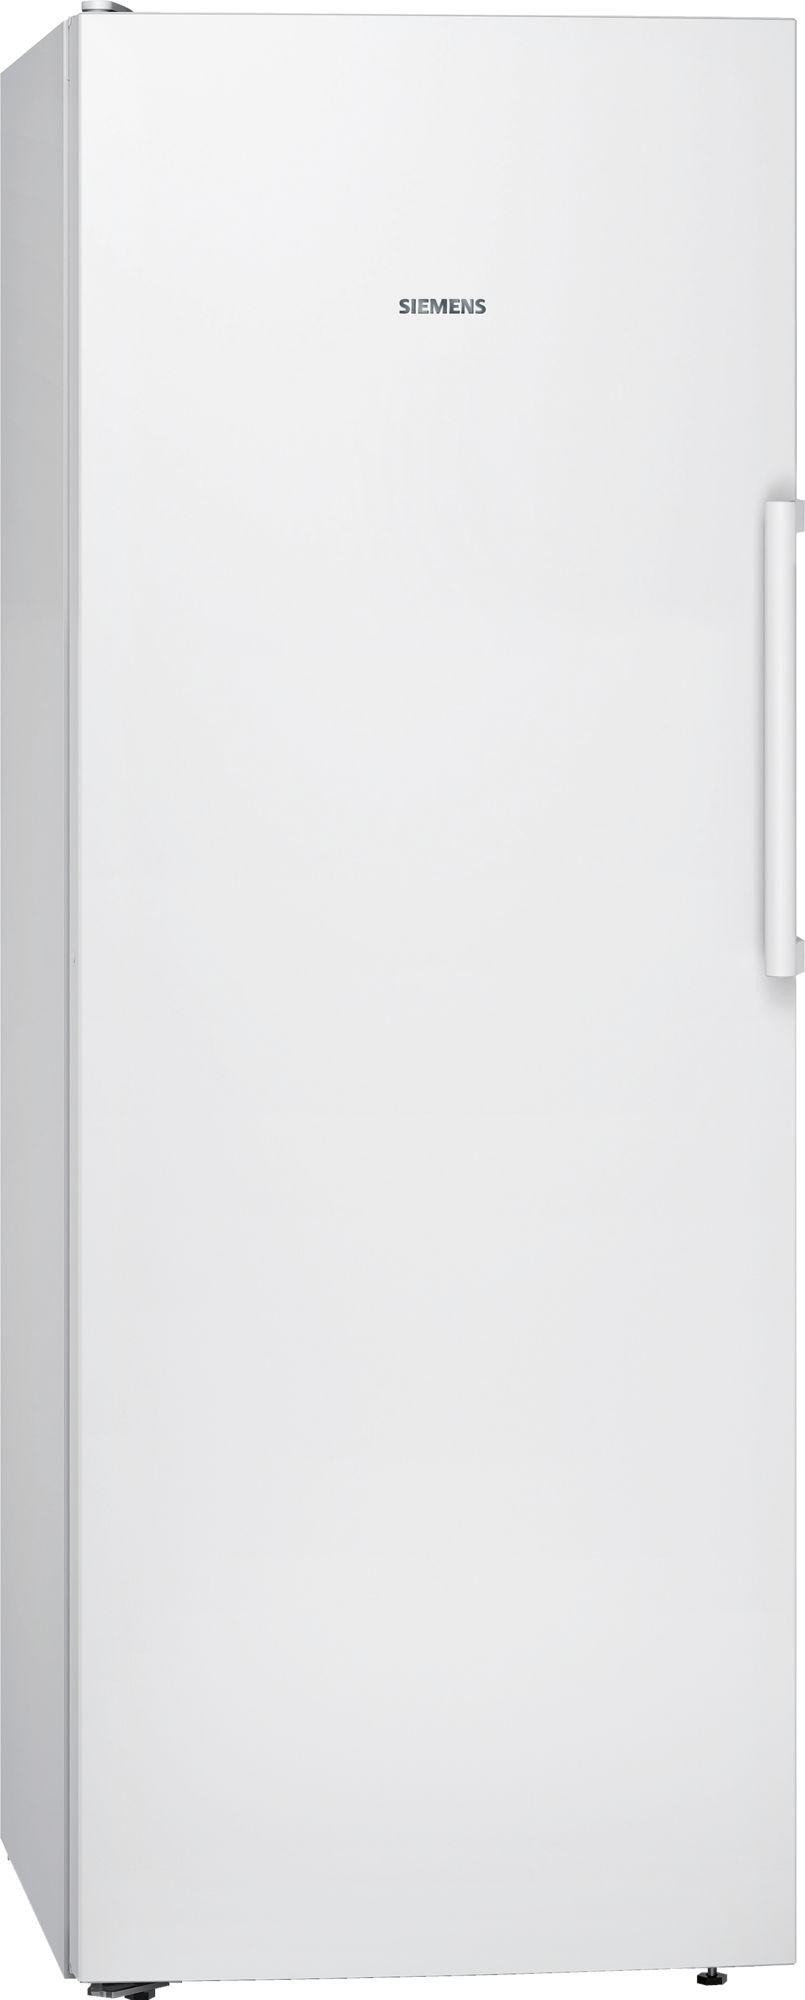 Siemens KS29VVW3P koelkast zonder vriesvak